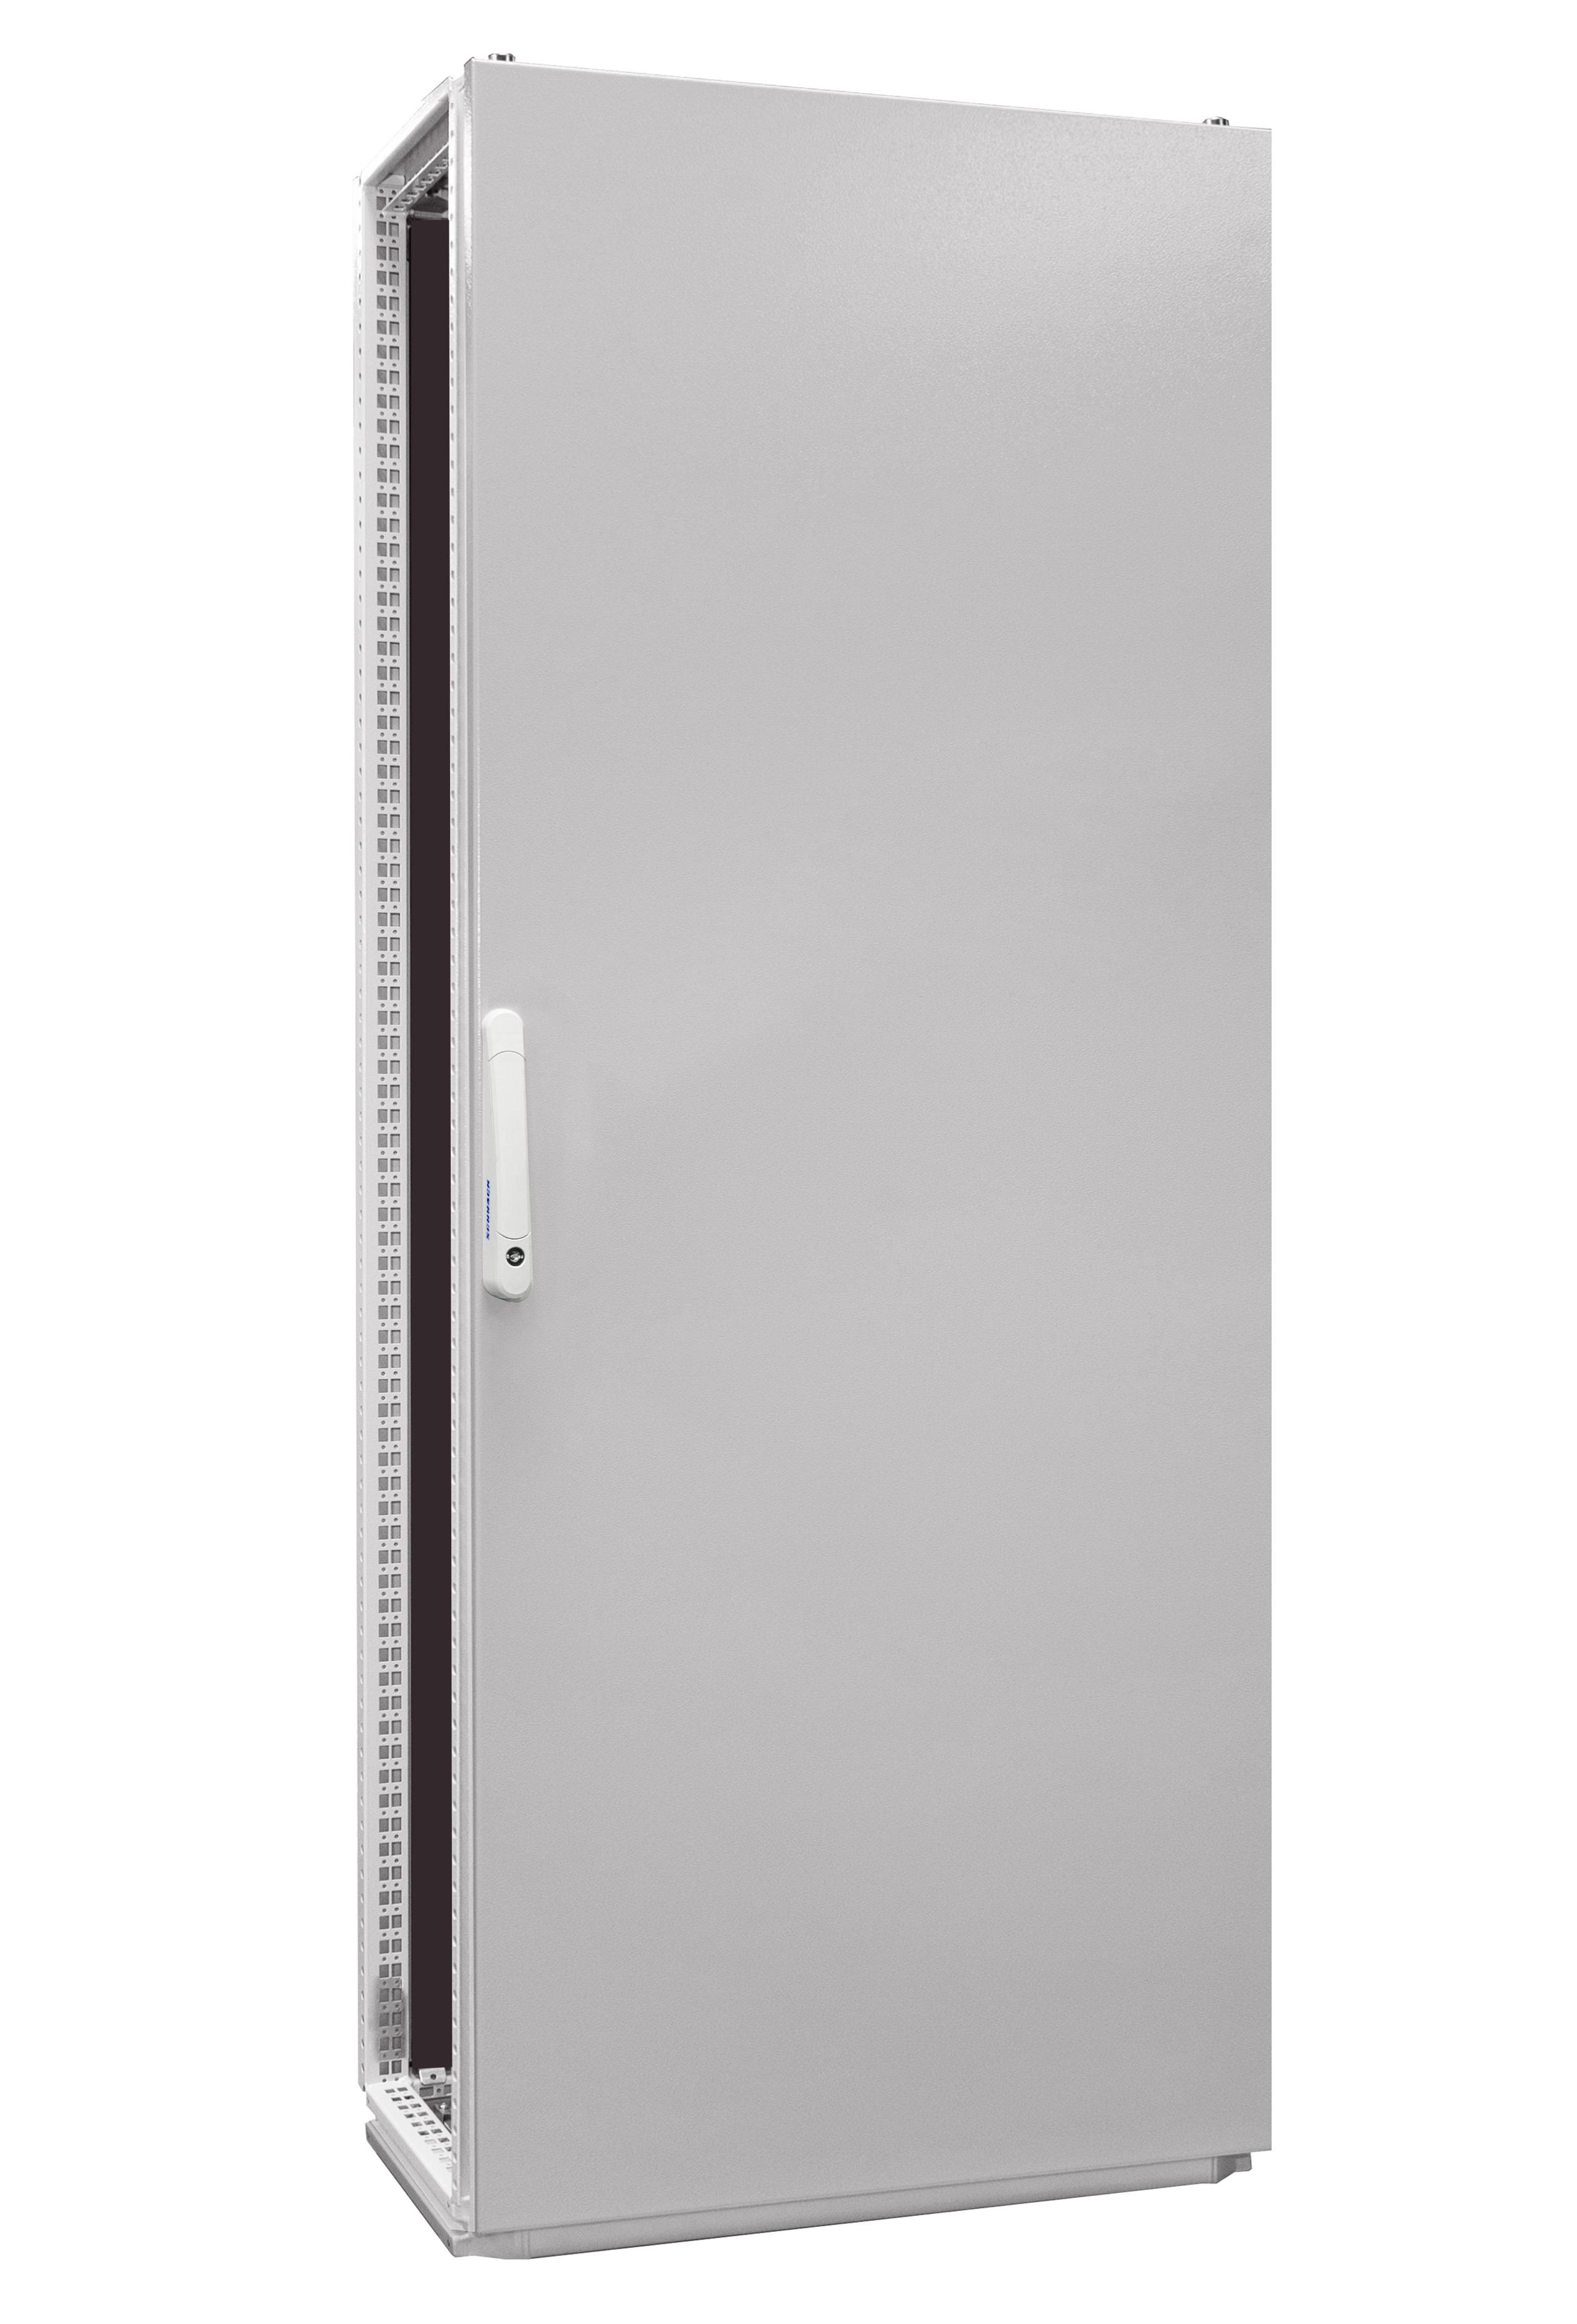 1 Stk Anreihschrank 1-Tür IP55 H=2000 B=800 T=400mm Stahlblech AC208041--